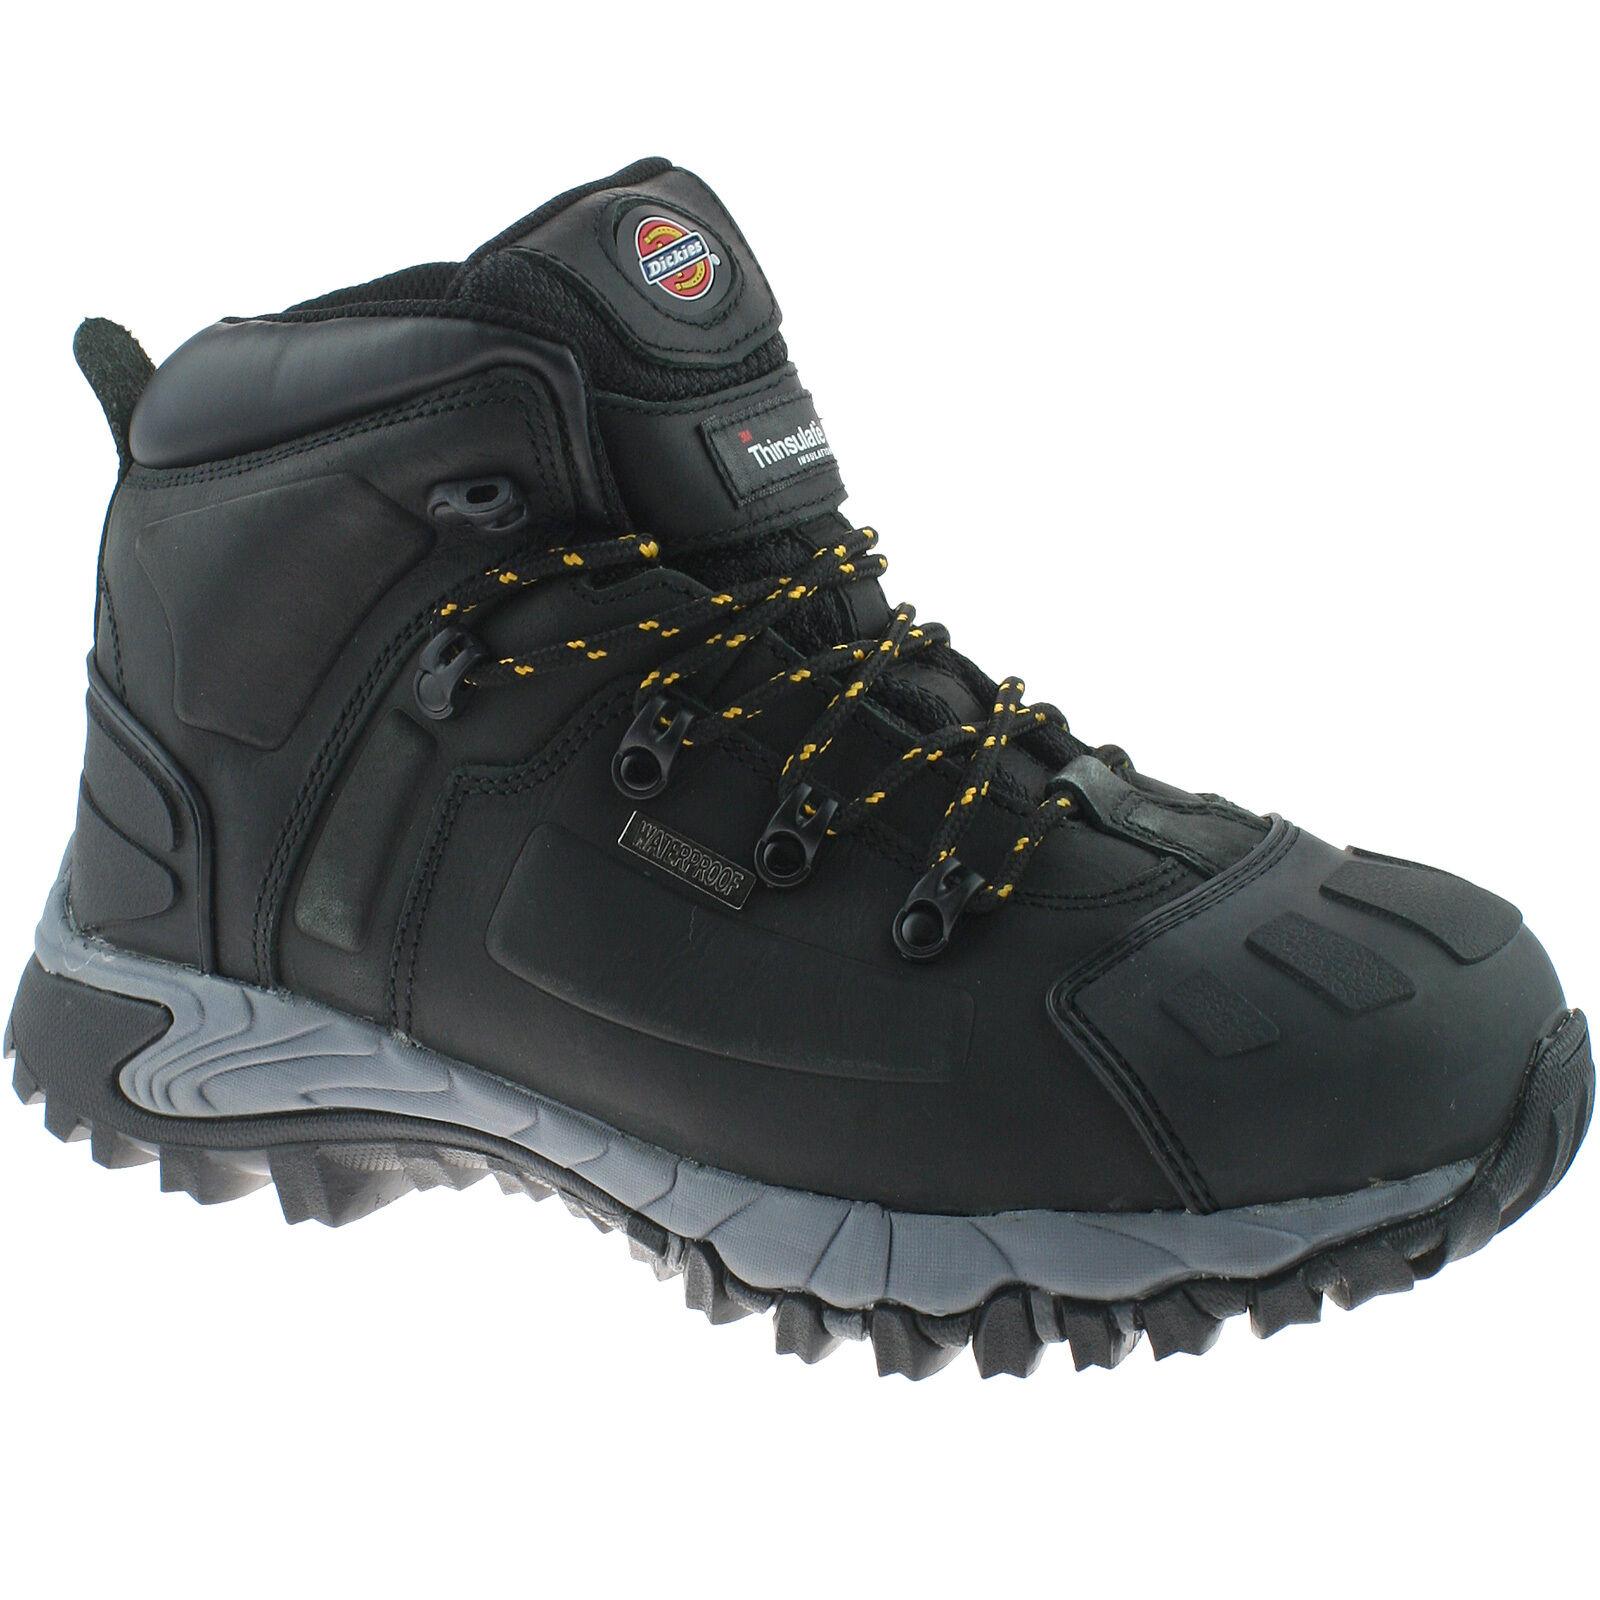 Dickies Medway Nero Sicurezza Stivali Taglia EU 44 FD23310 Impermeabile Hiker